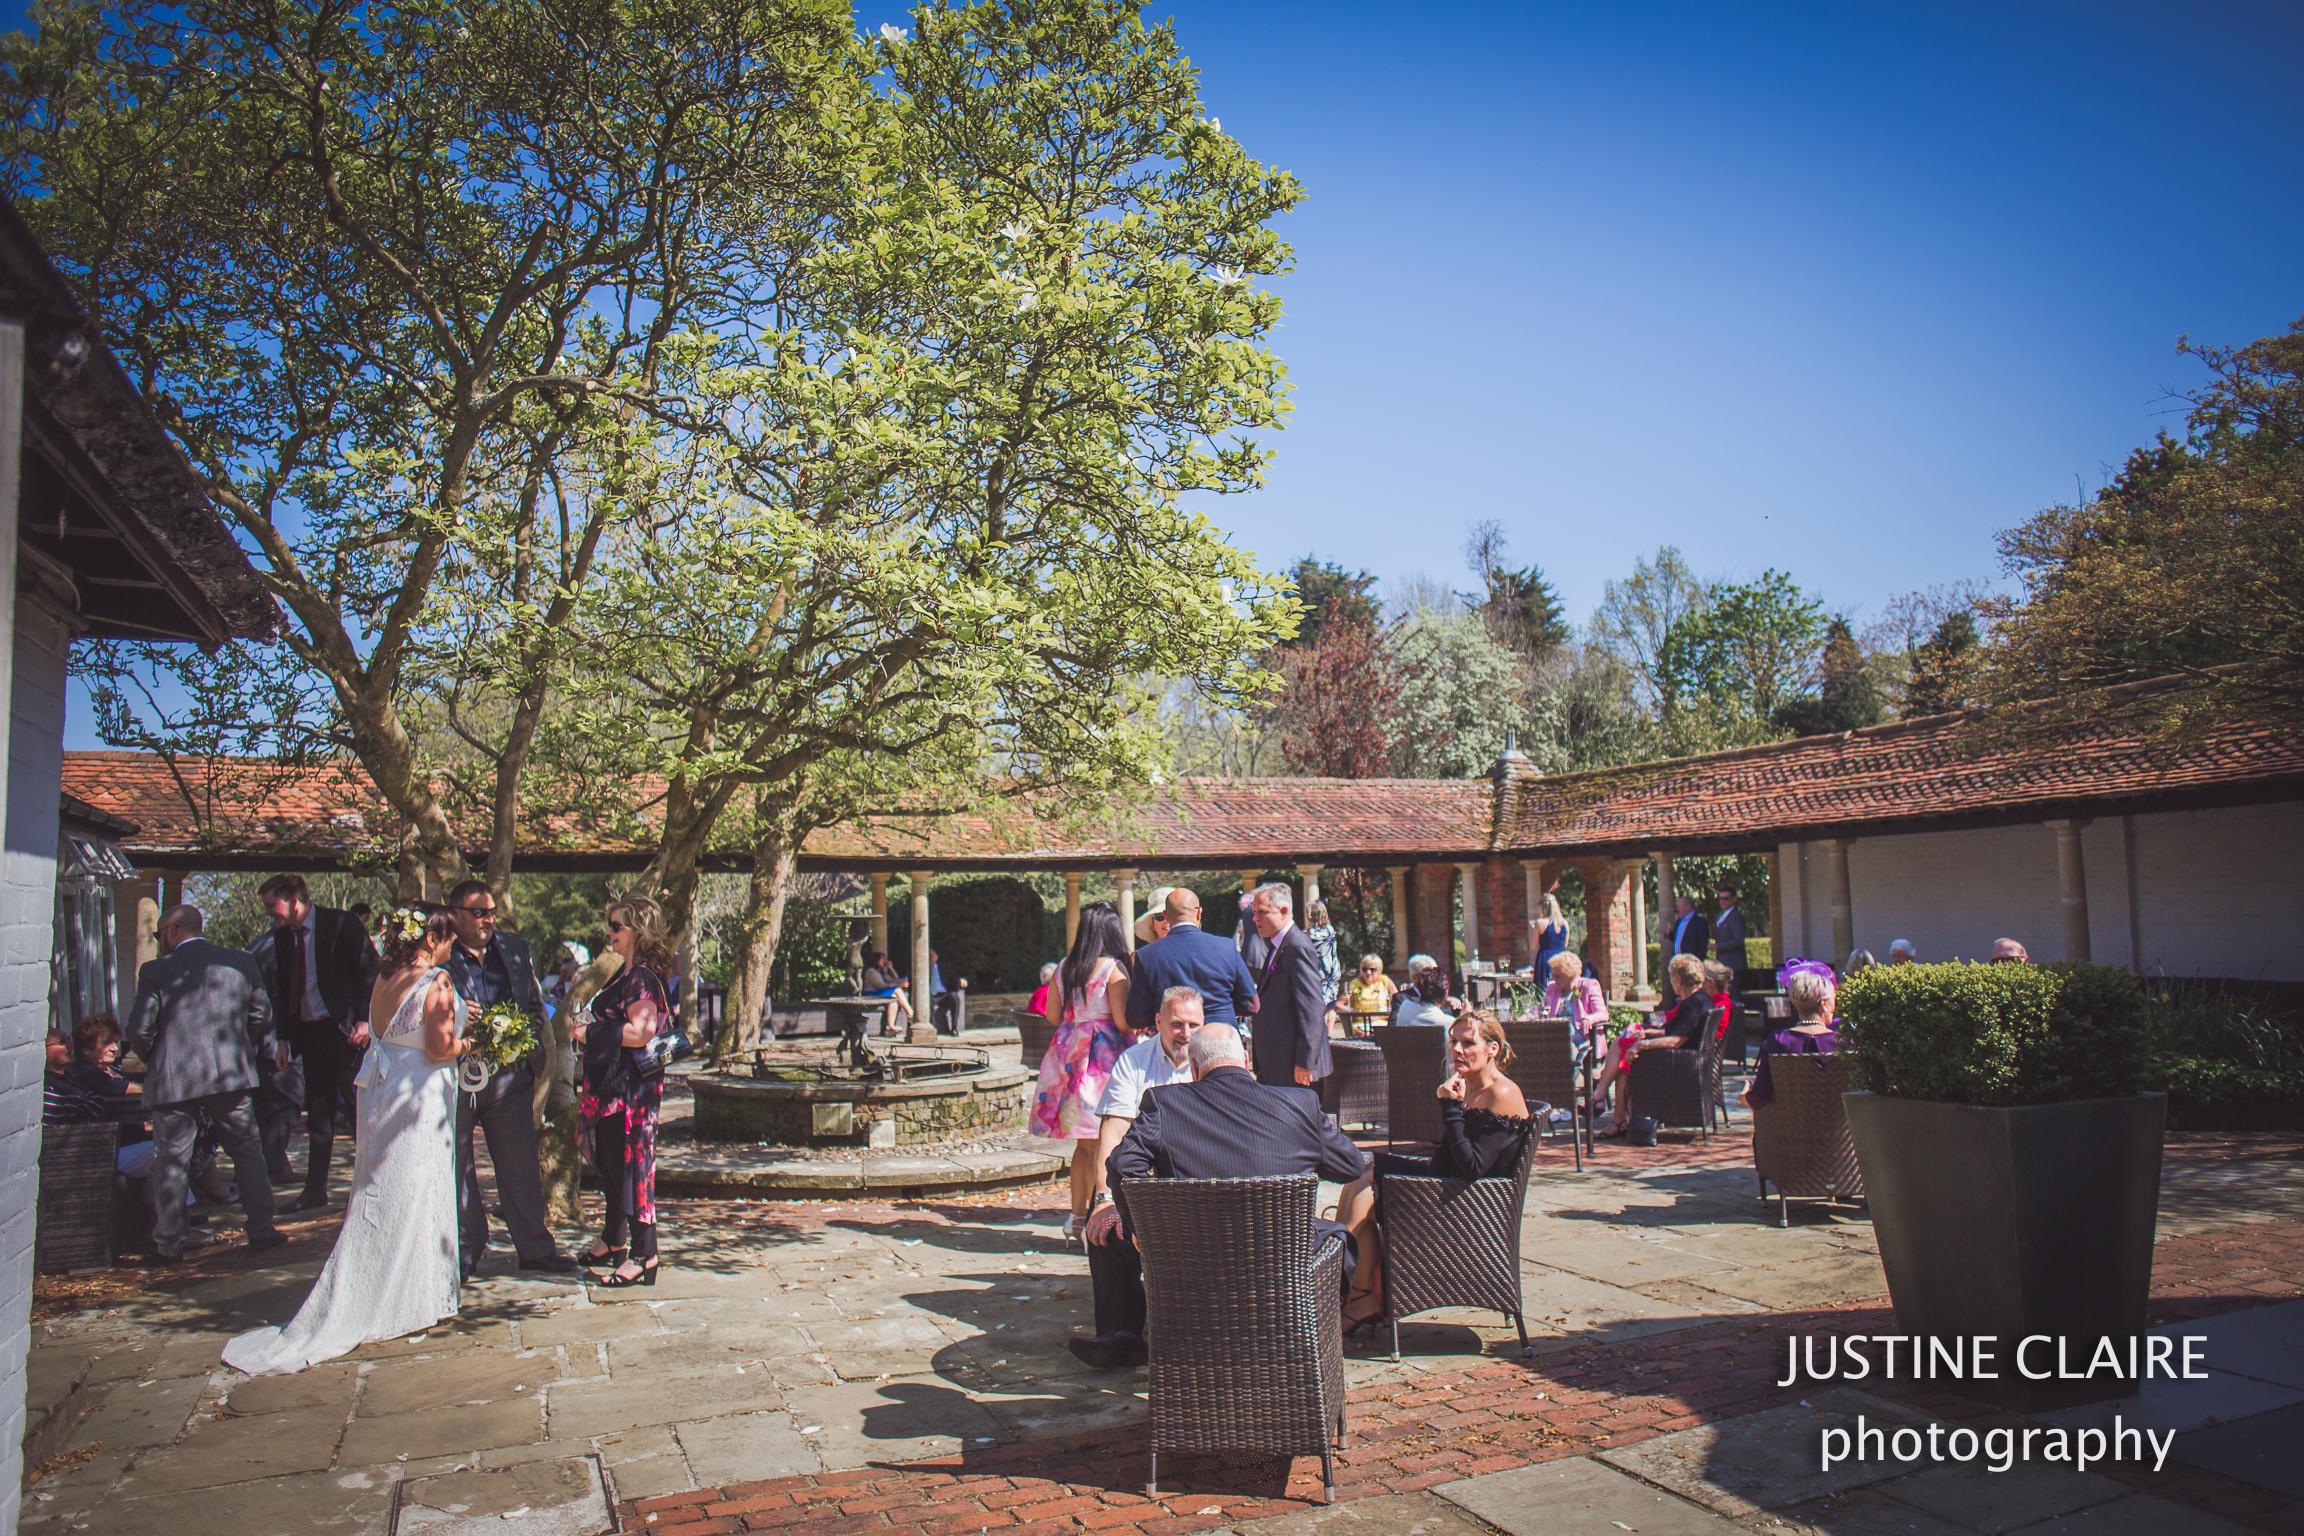 Rusper Wedding Ghyll Manor Horsham Wedding photography-5.jpg